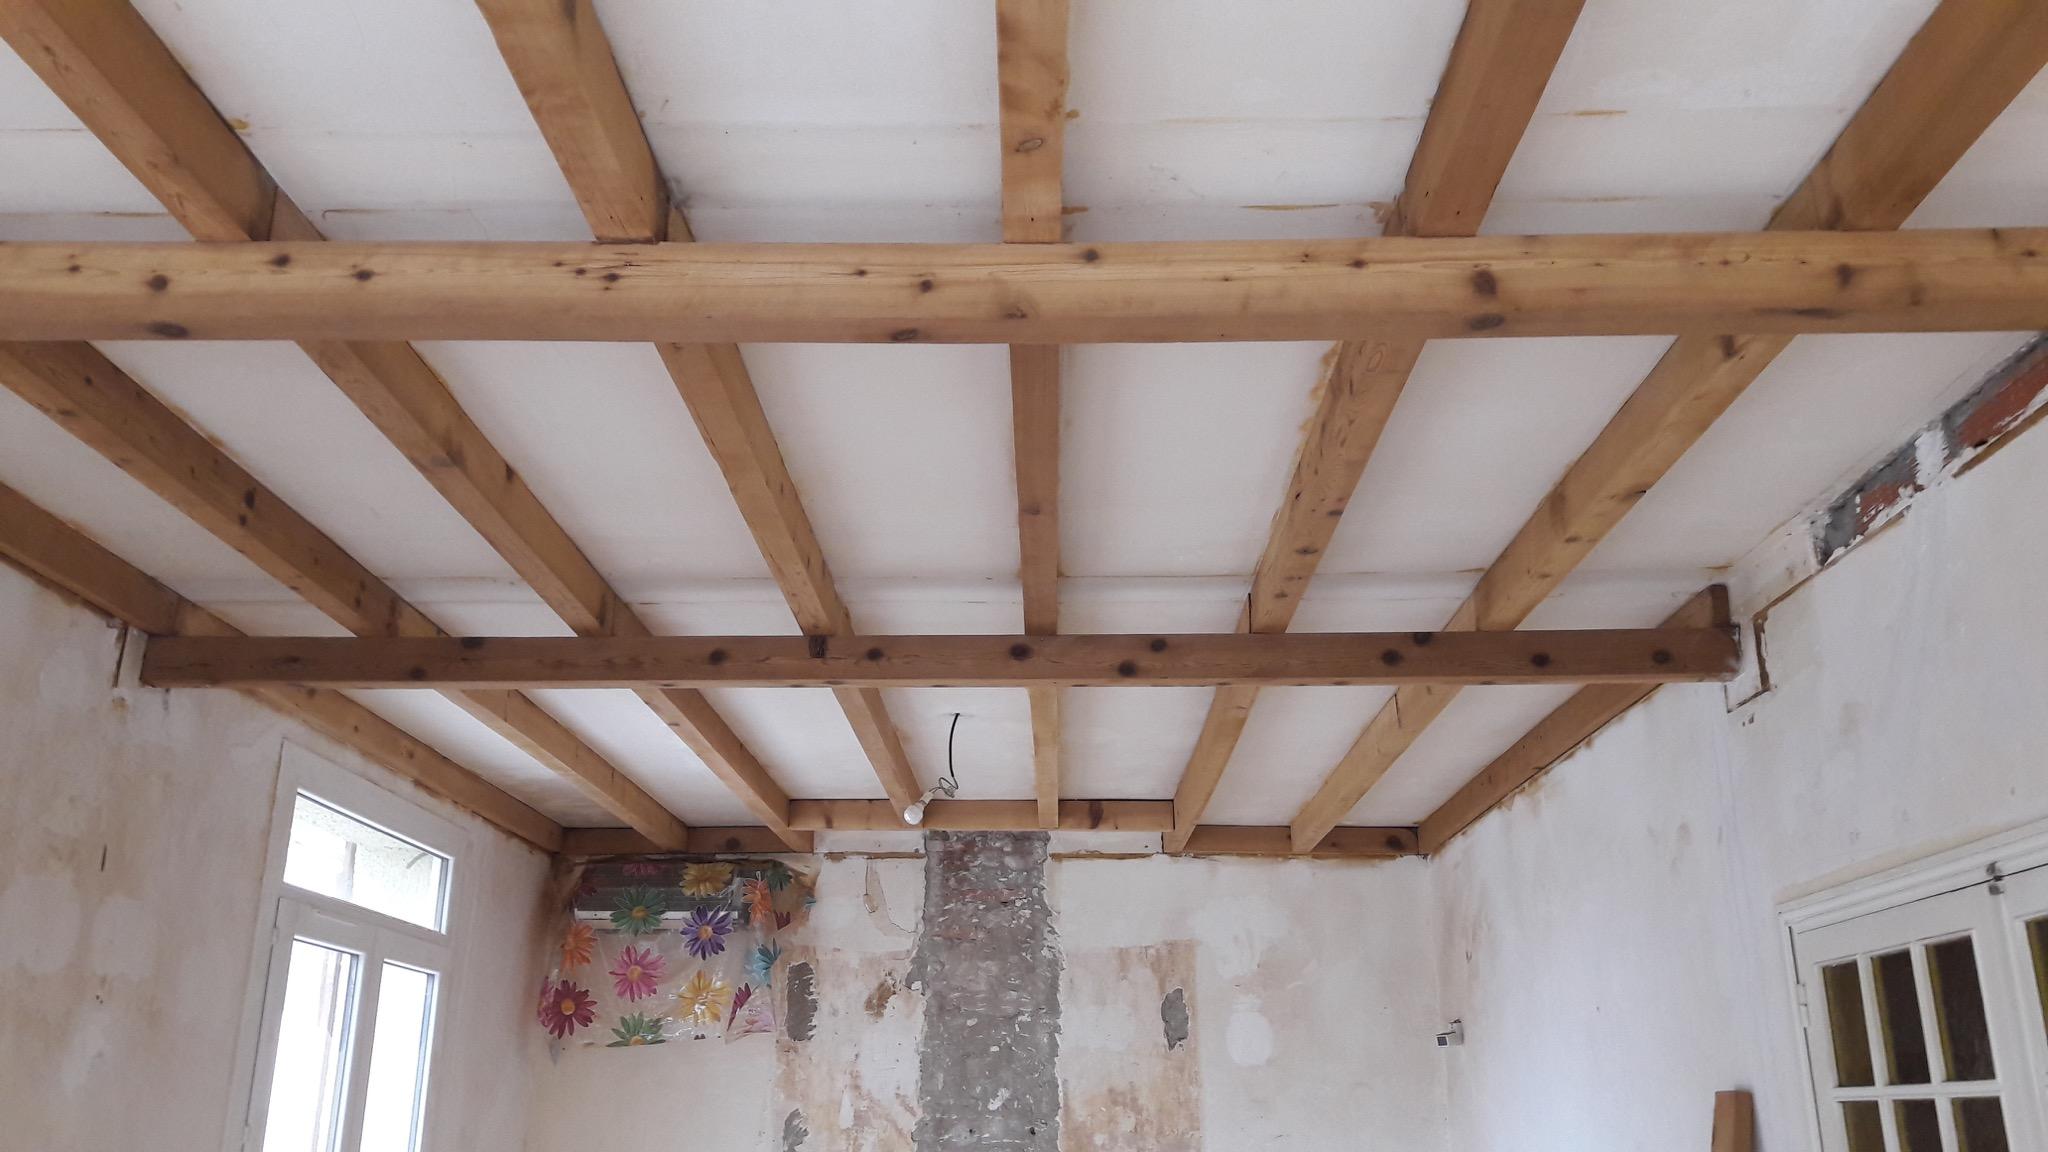 r solu peindre ou lasurer des poutres en bois. Black Bedroom Furniture Sets. Home Design Ideas